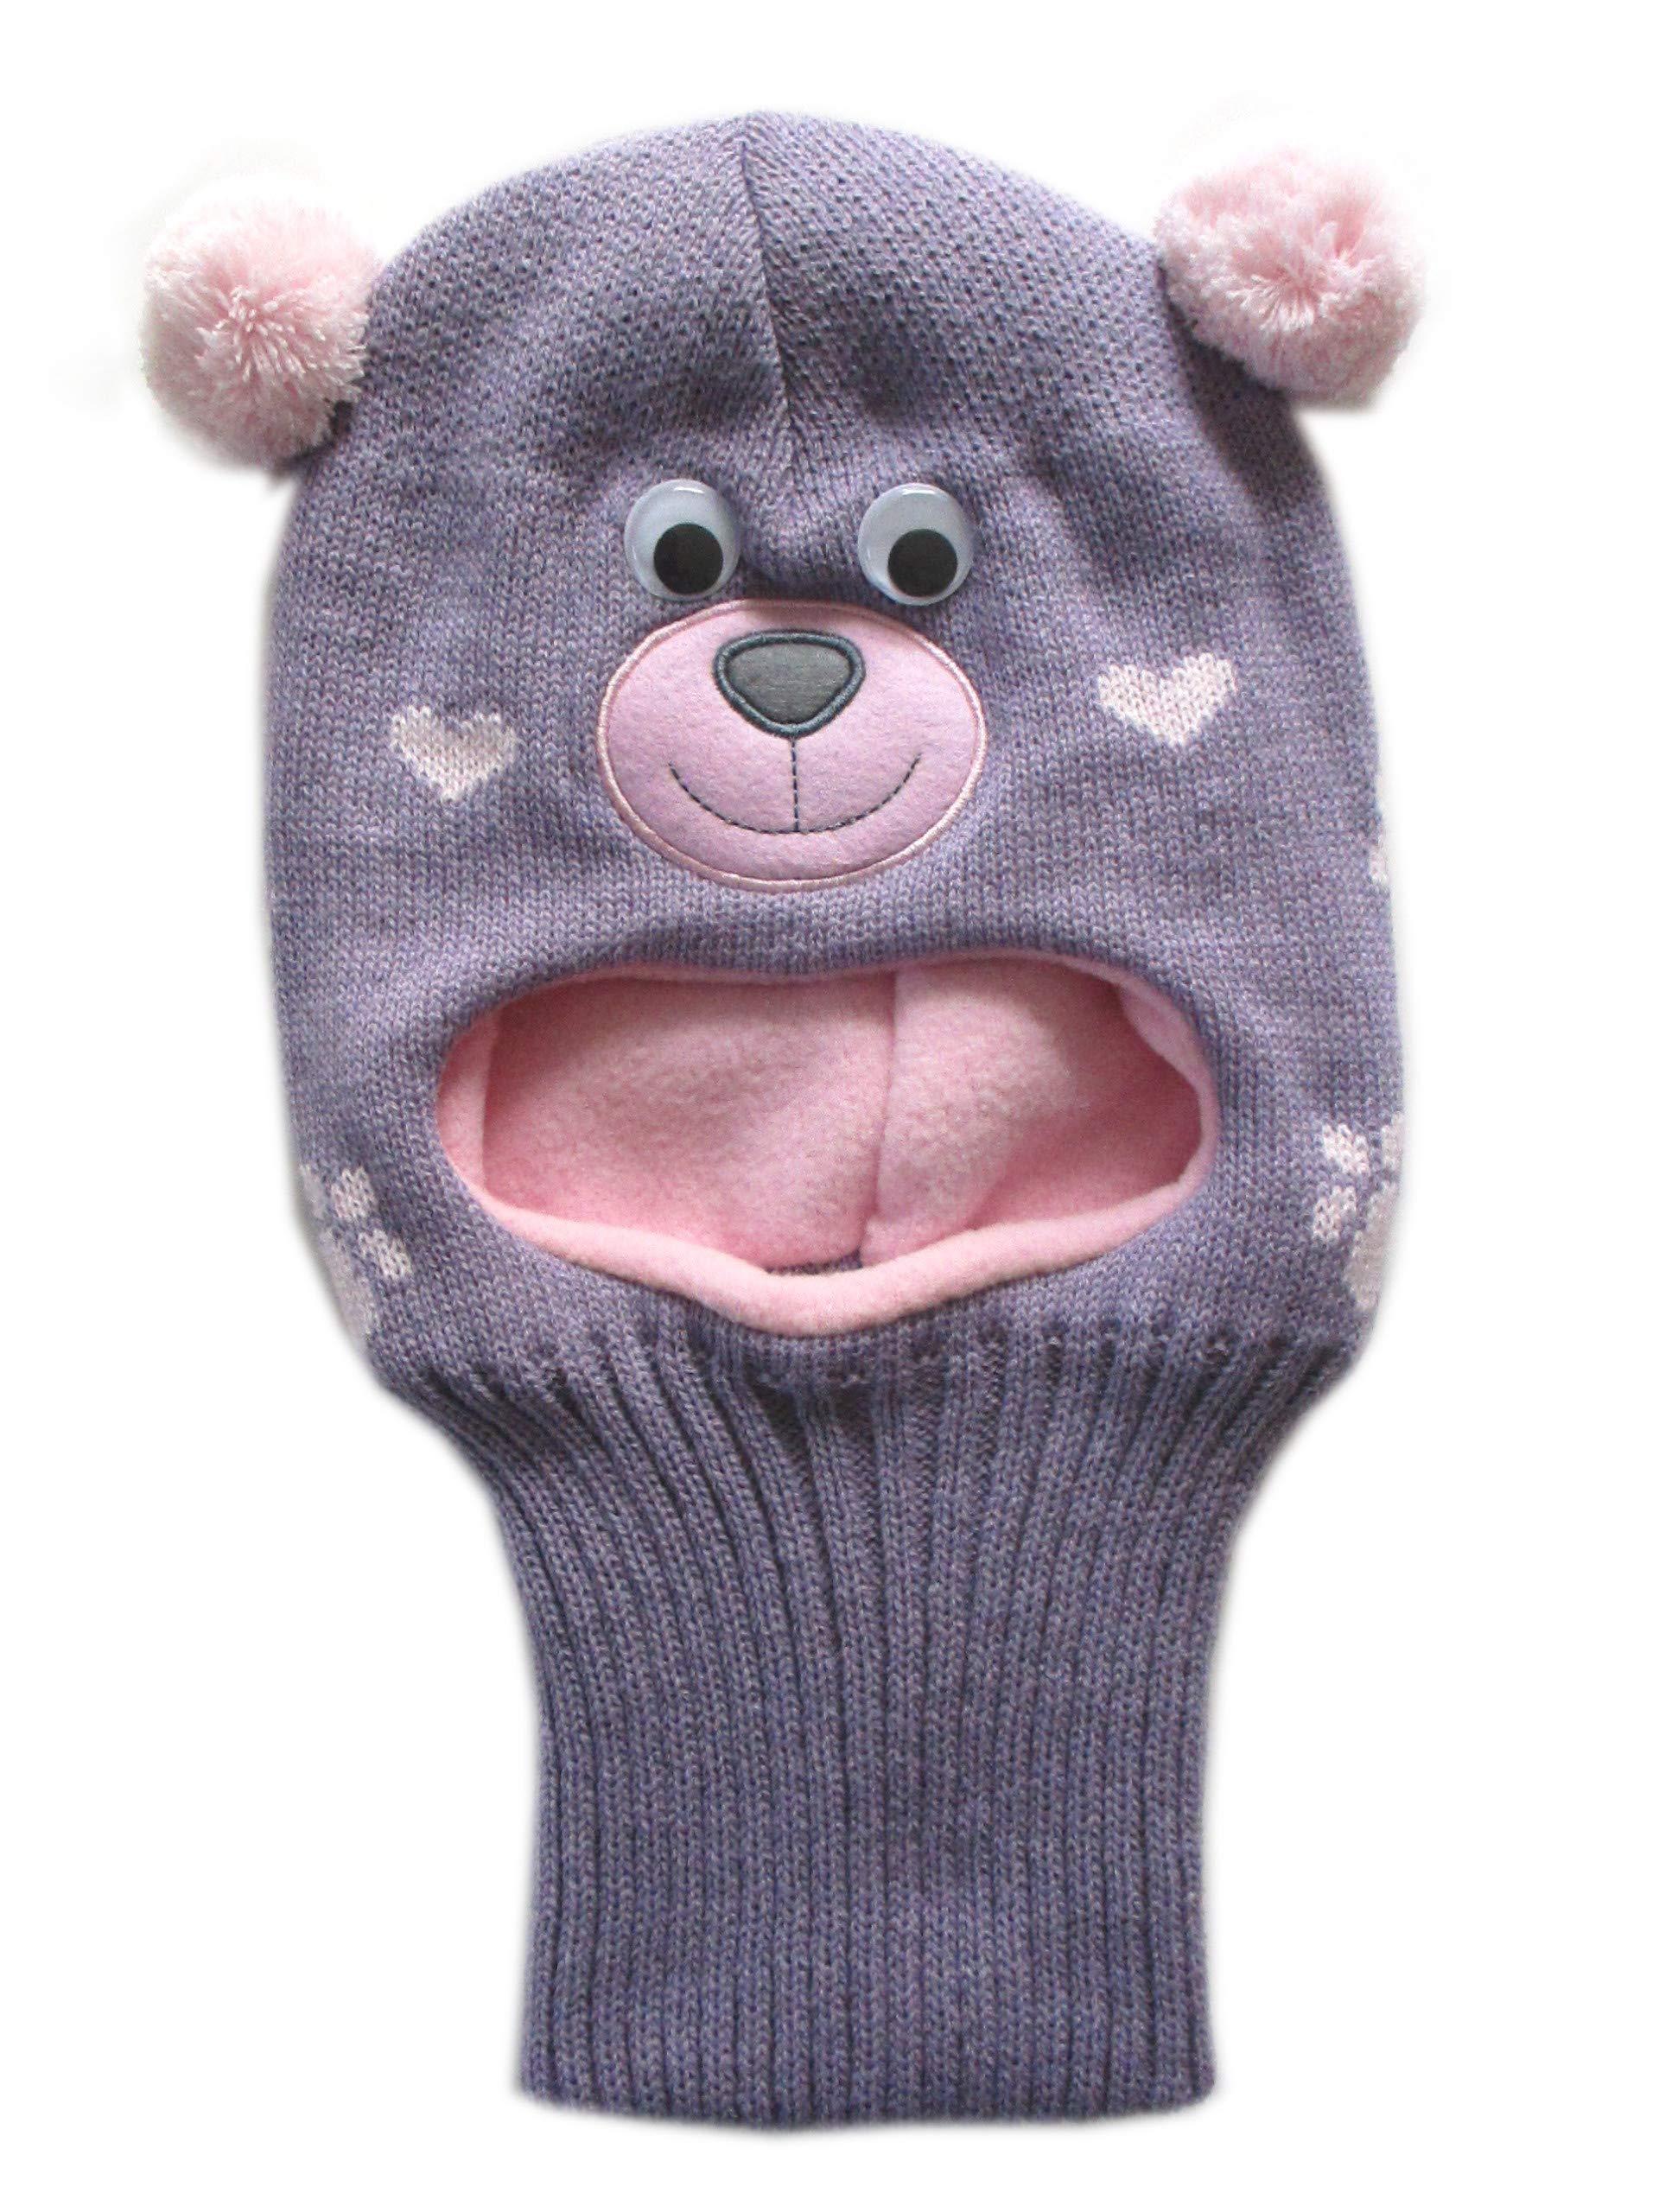 bf111b4e1ea61 Frost Hats Warm Winter Hat Fleece Lined Balaclava for Kids Ski Mask for  Girls M-